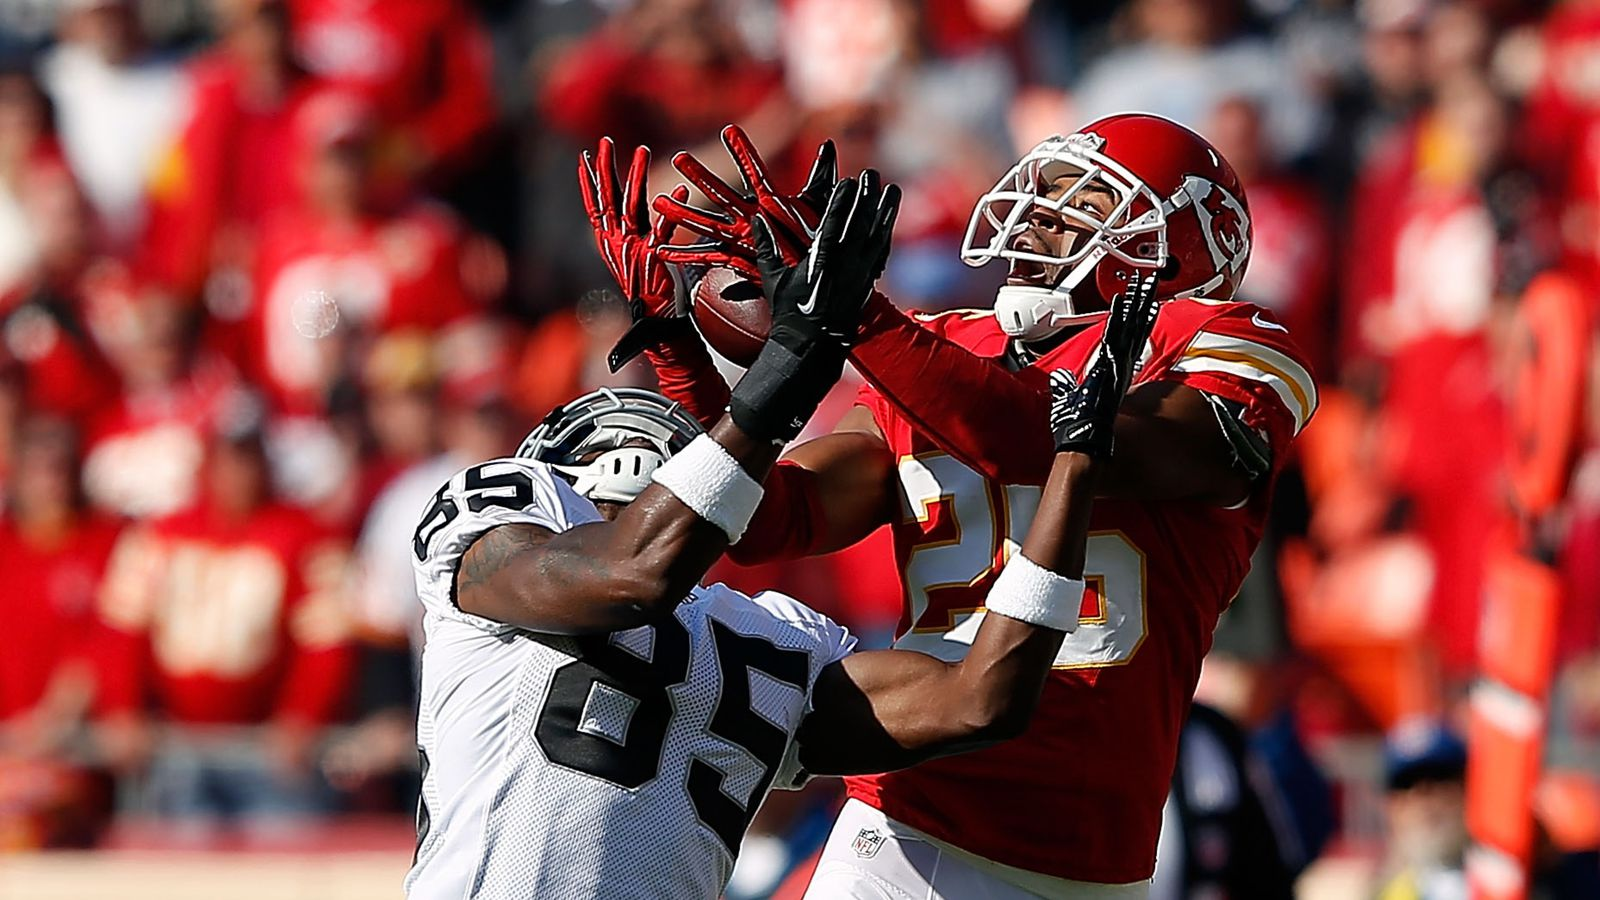 Chiefs Release Cornerback Stanford Routt Sbnation Com